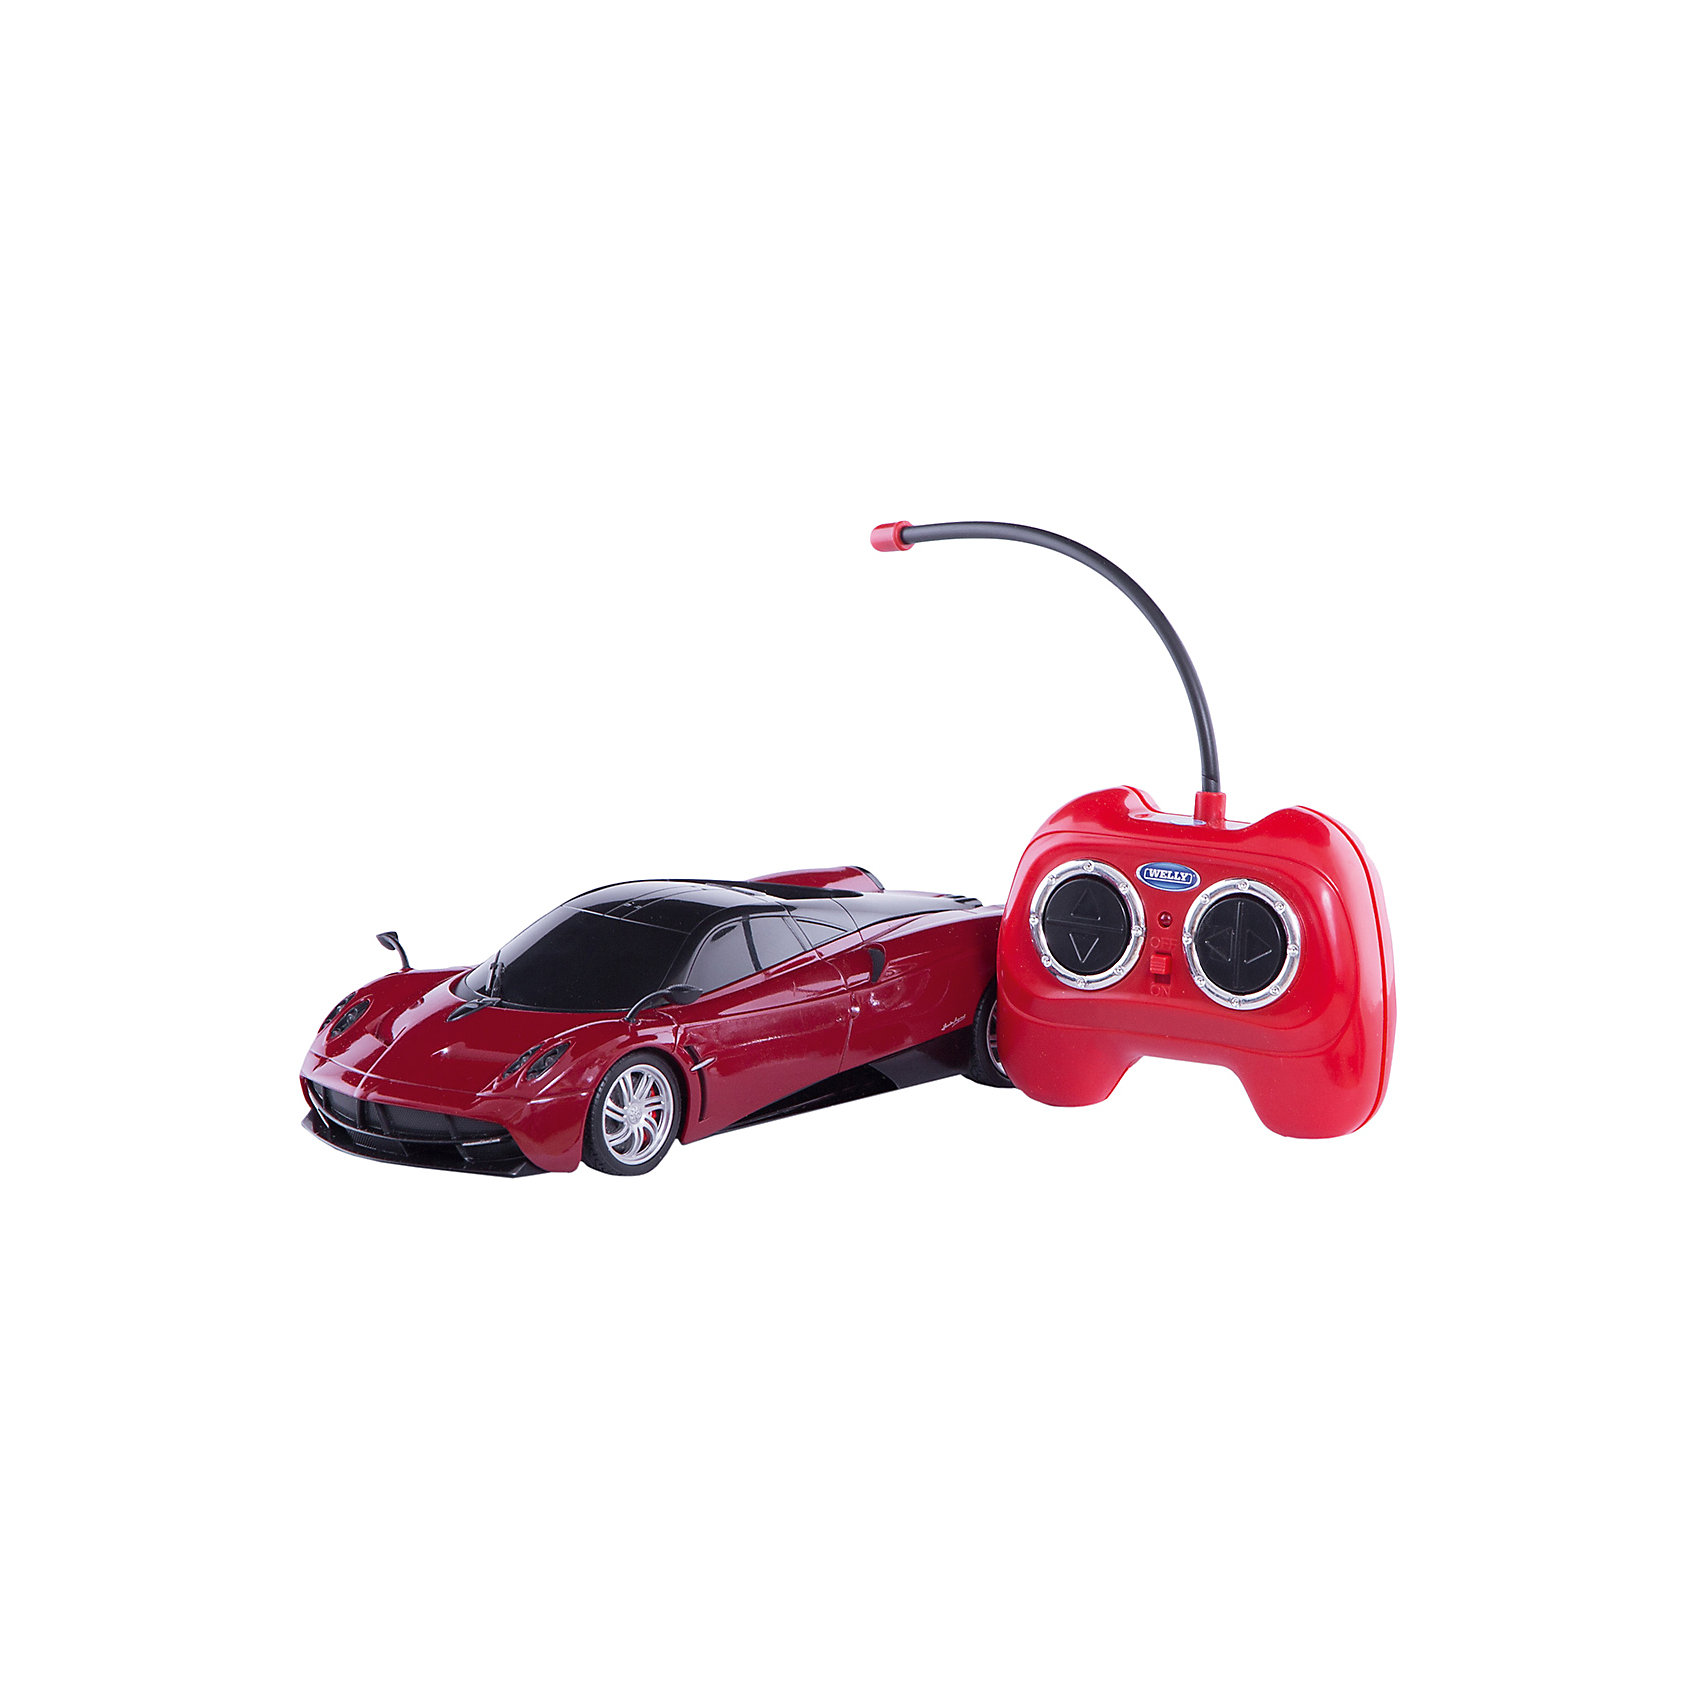 Welly Модель машины 1:24 Pagani Huayra, р/у, Welly брелок для машины рено